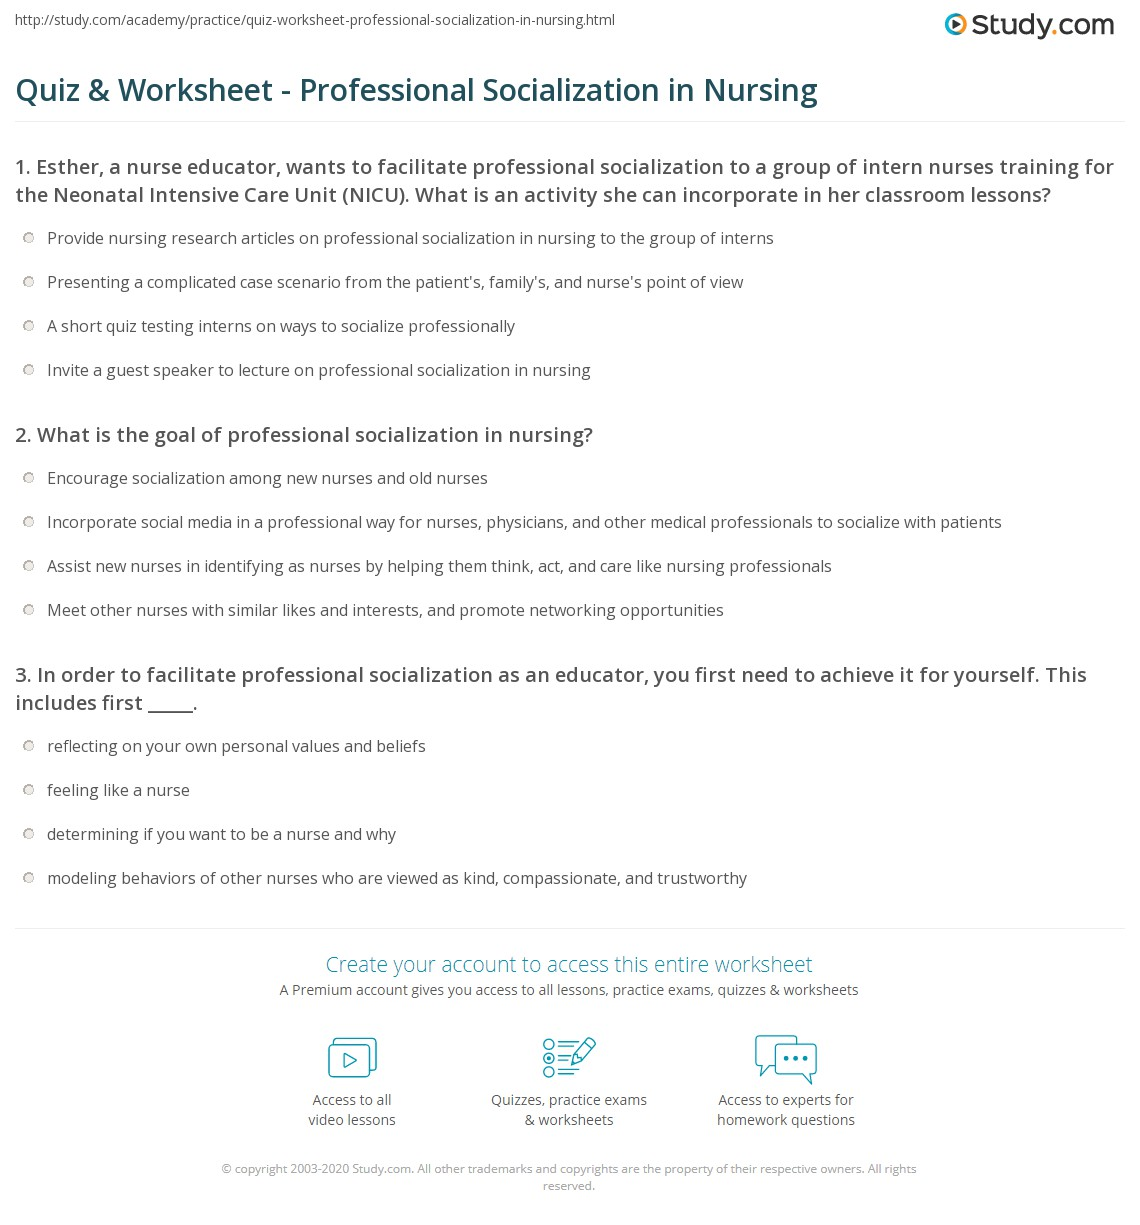 Quiz & Worksheet - Professional Socialization in Nursing